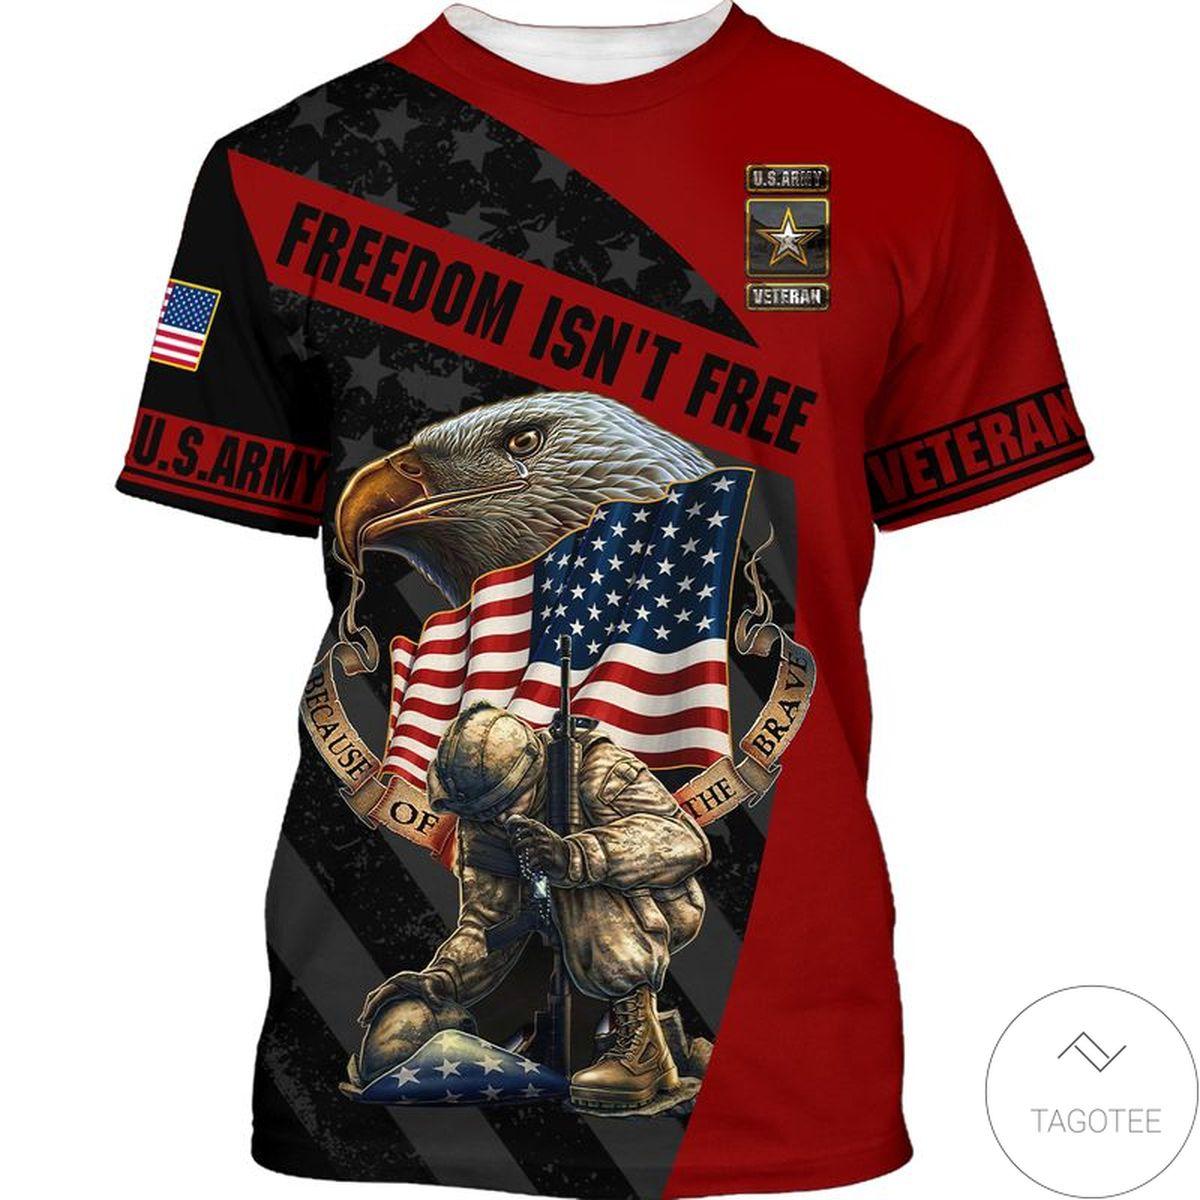 Great Quality Army Veteran Us Flag Freedom Isn't Free T-Shirt